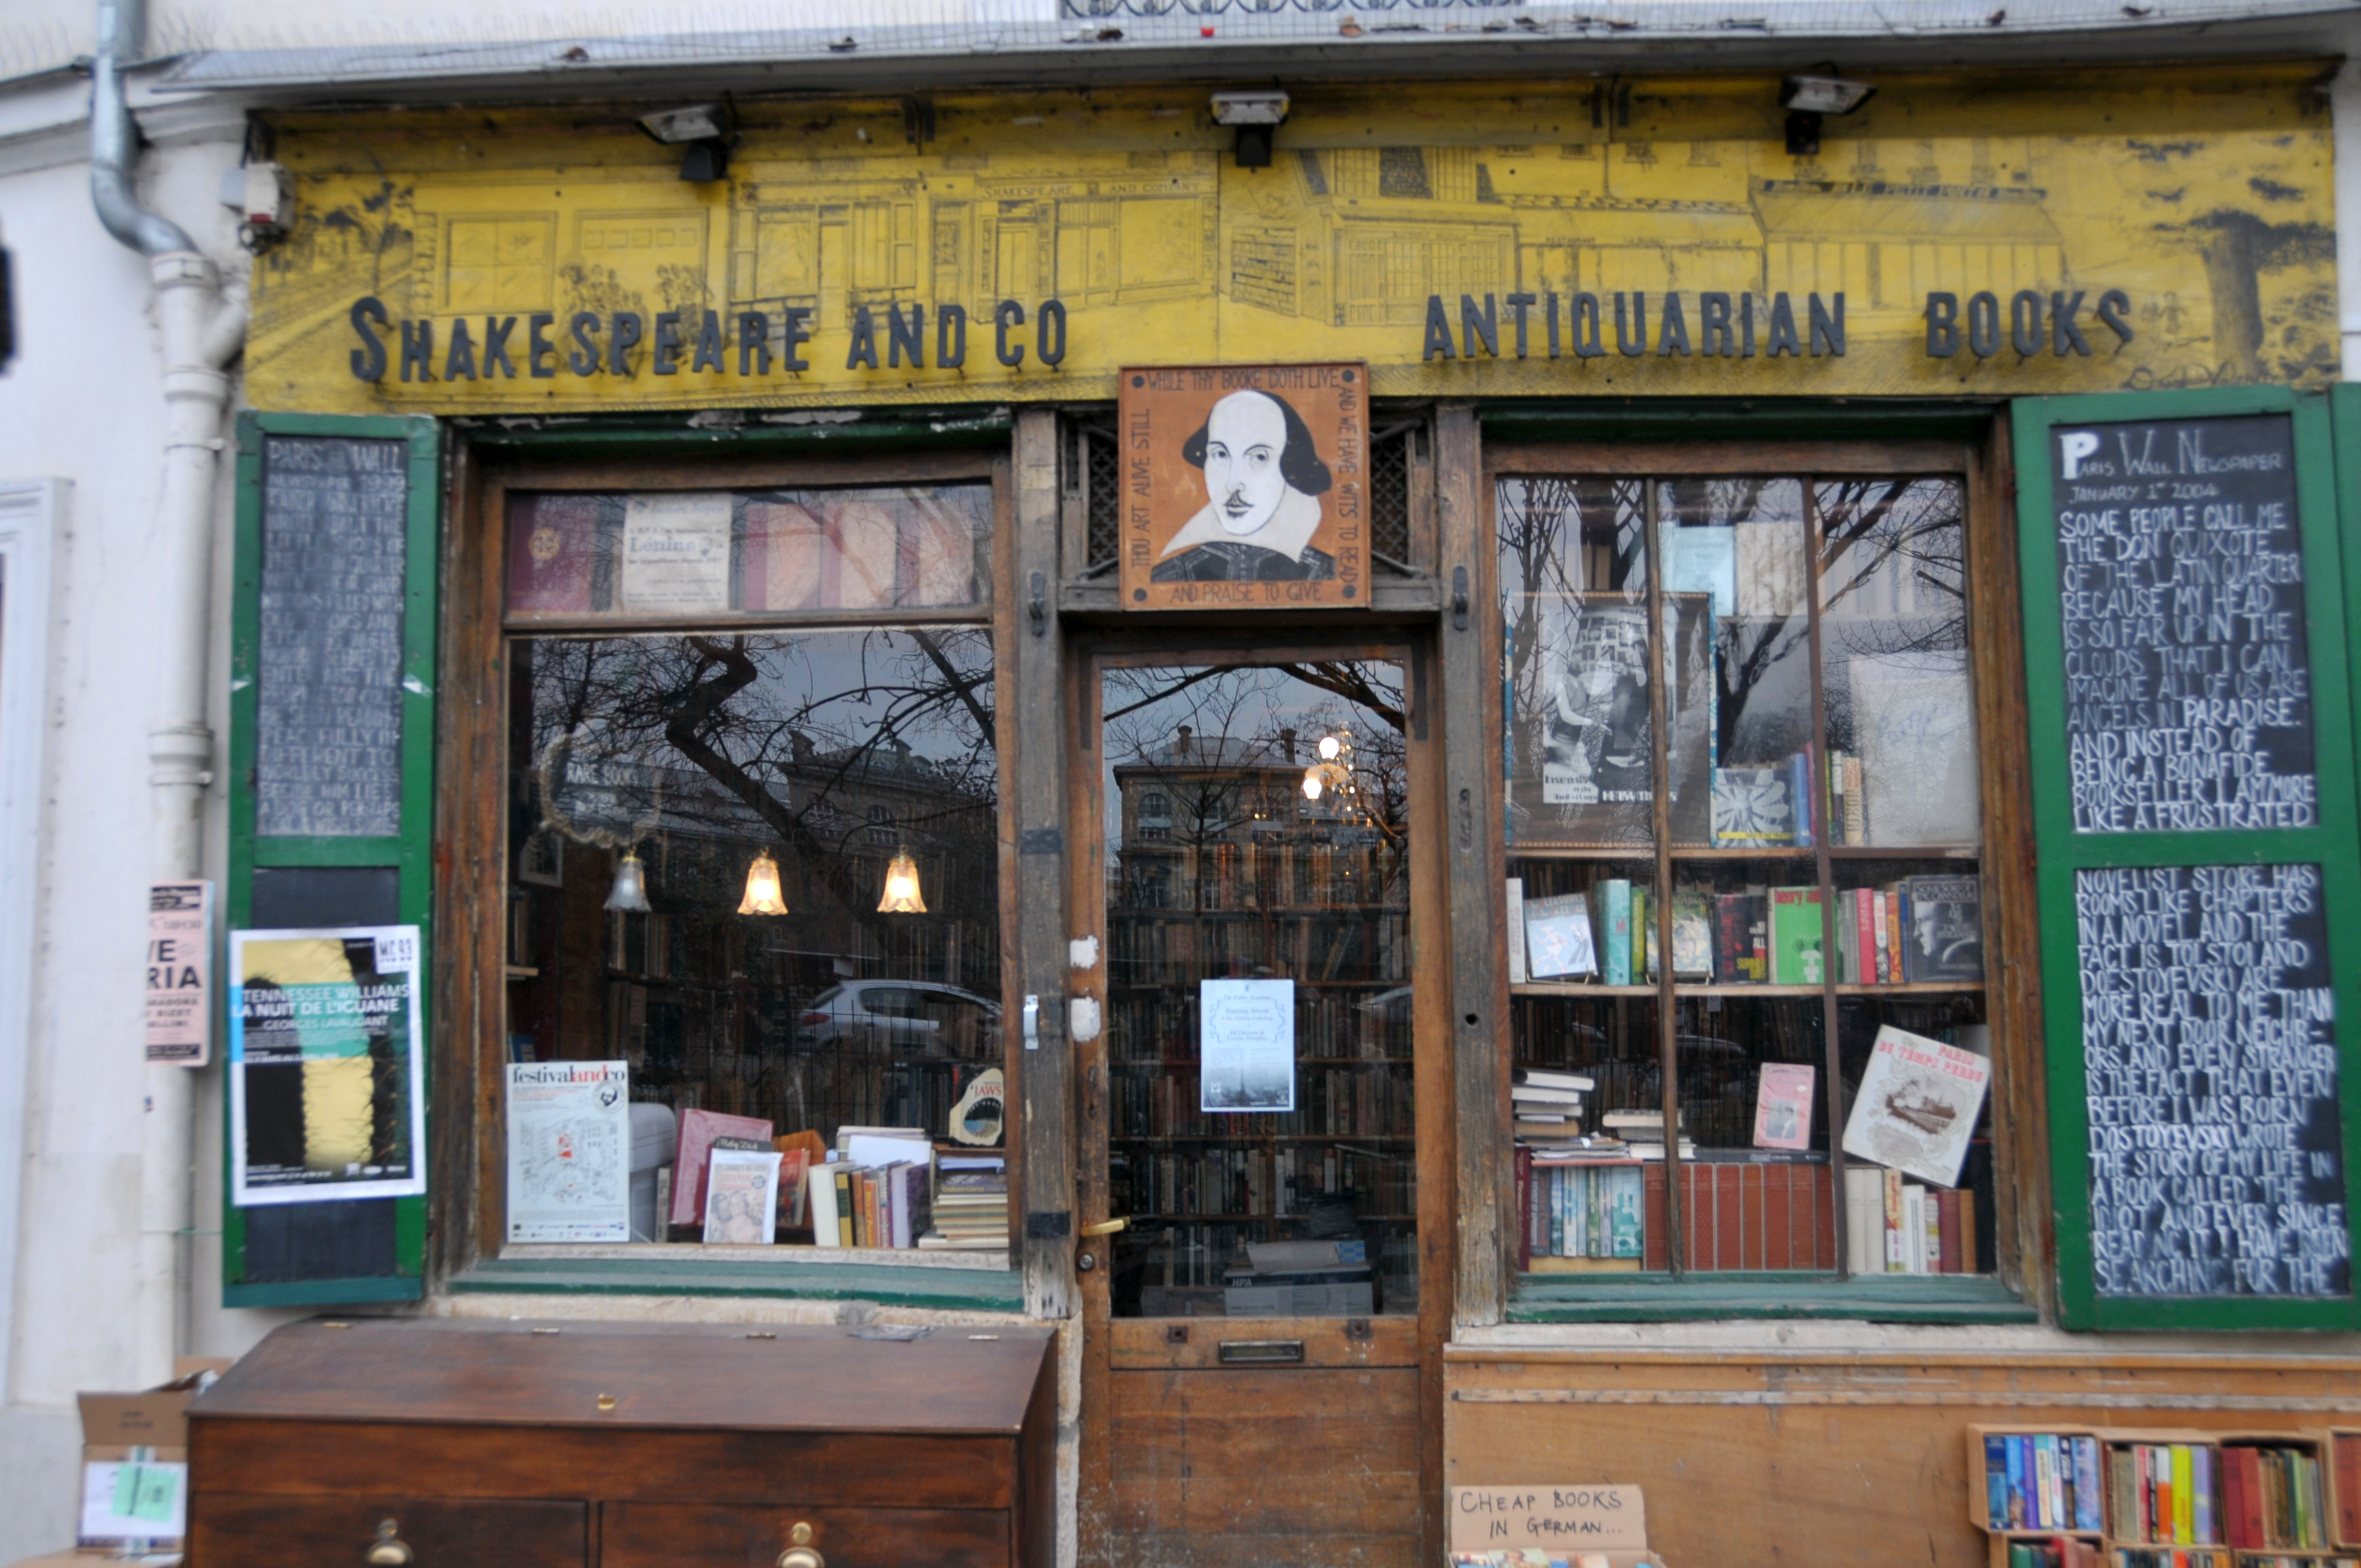 Filefamous Antique Bookstore (3358404146)jpg  Wikimedia